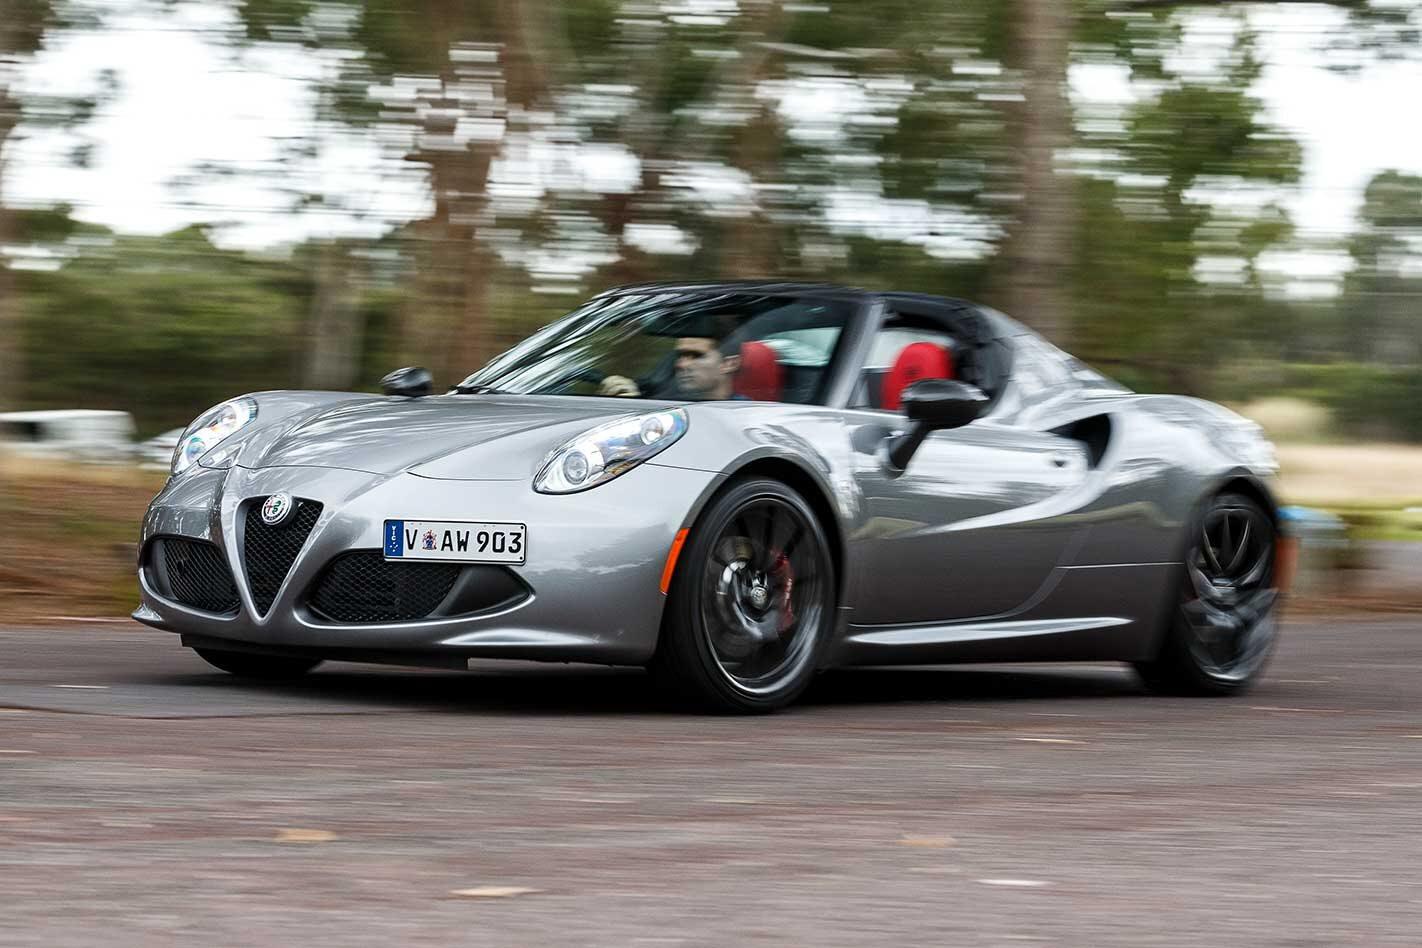 2019 Alfa Romeo 4C Spider performance review